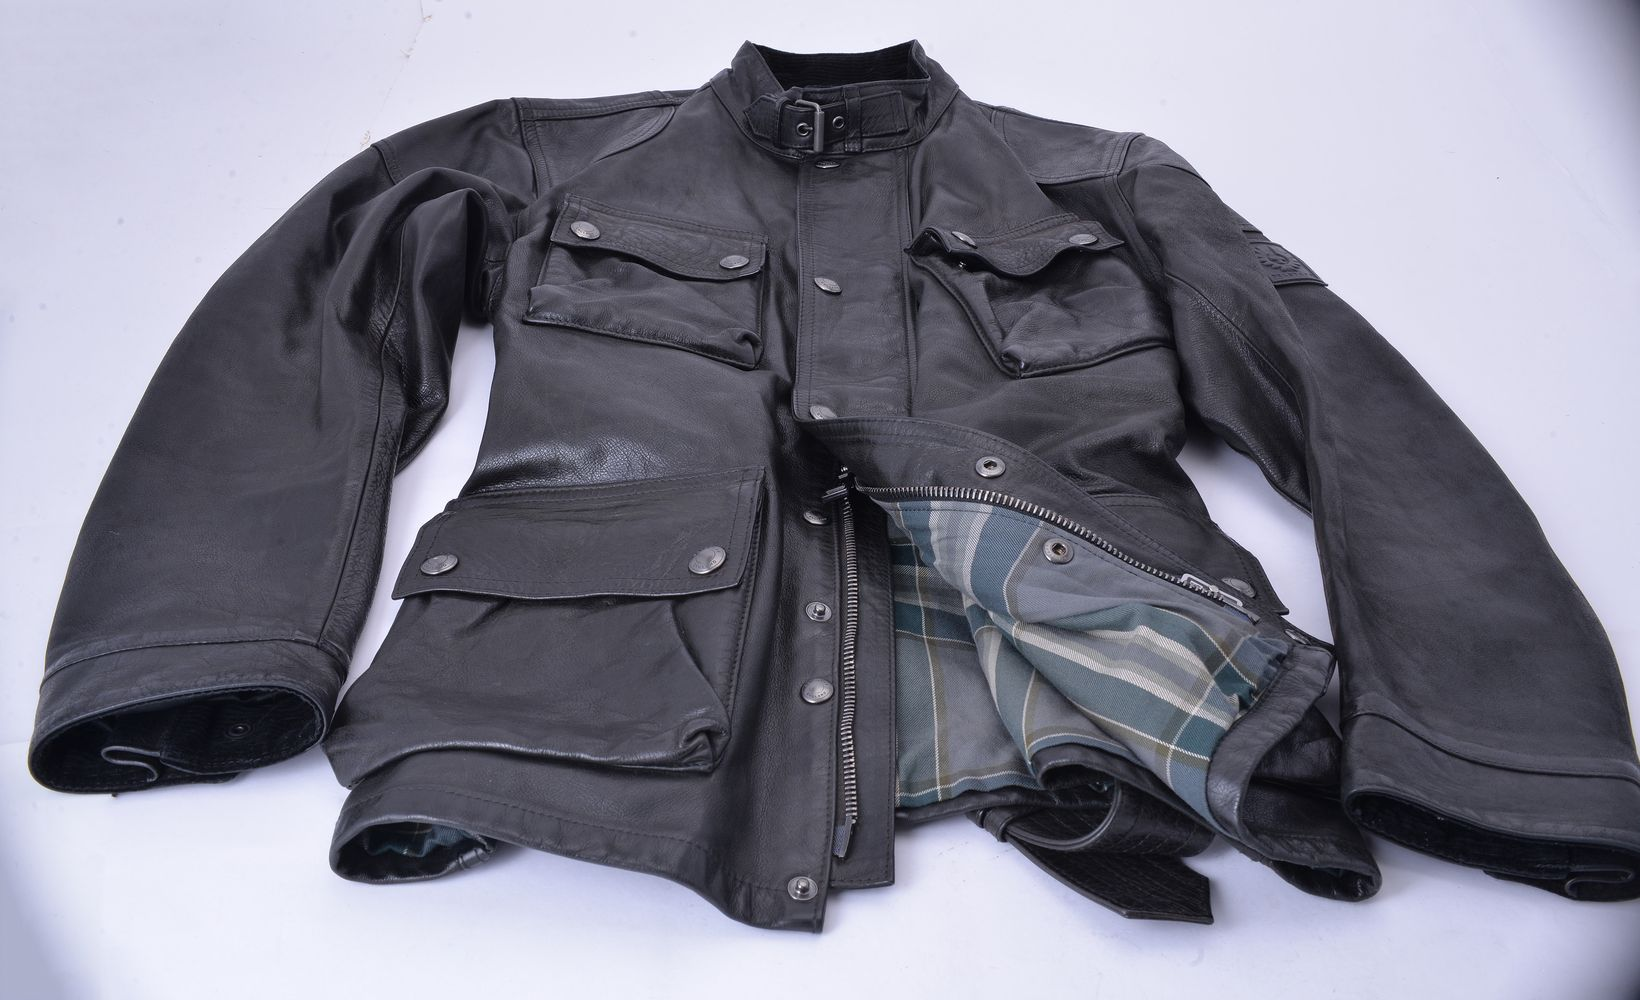 Lot 1108 - Belstaff, Panther 1966, a black leather jacket